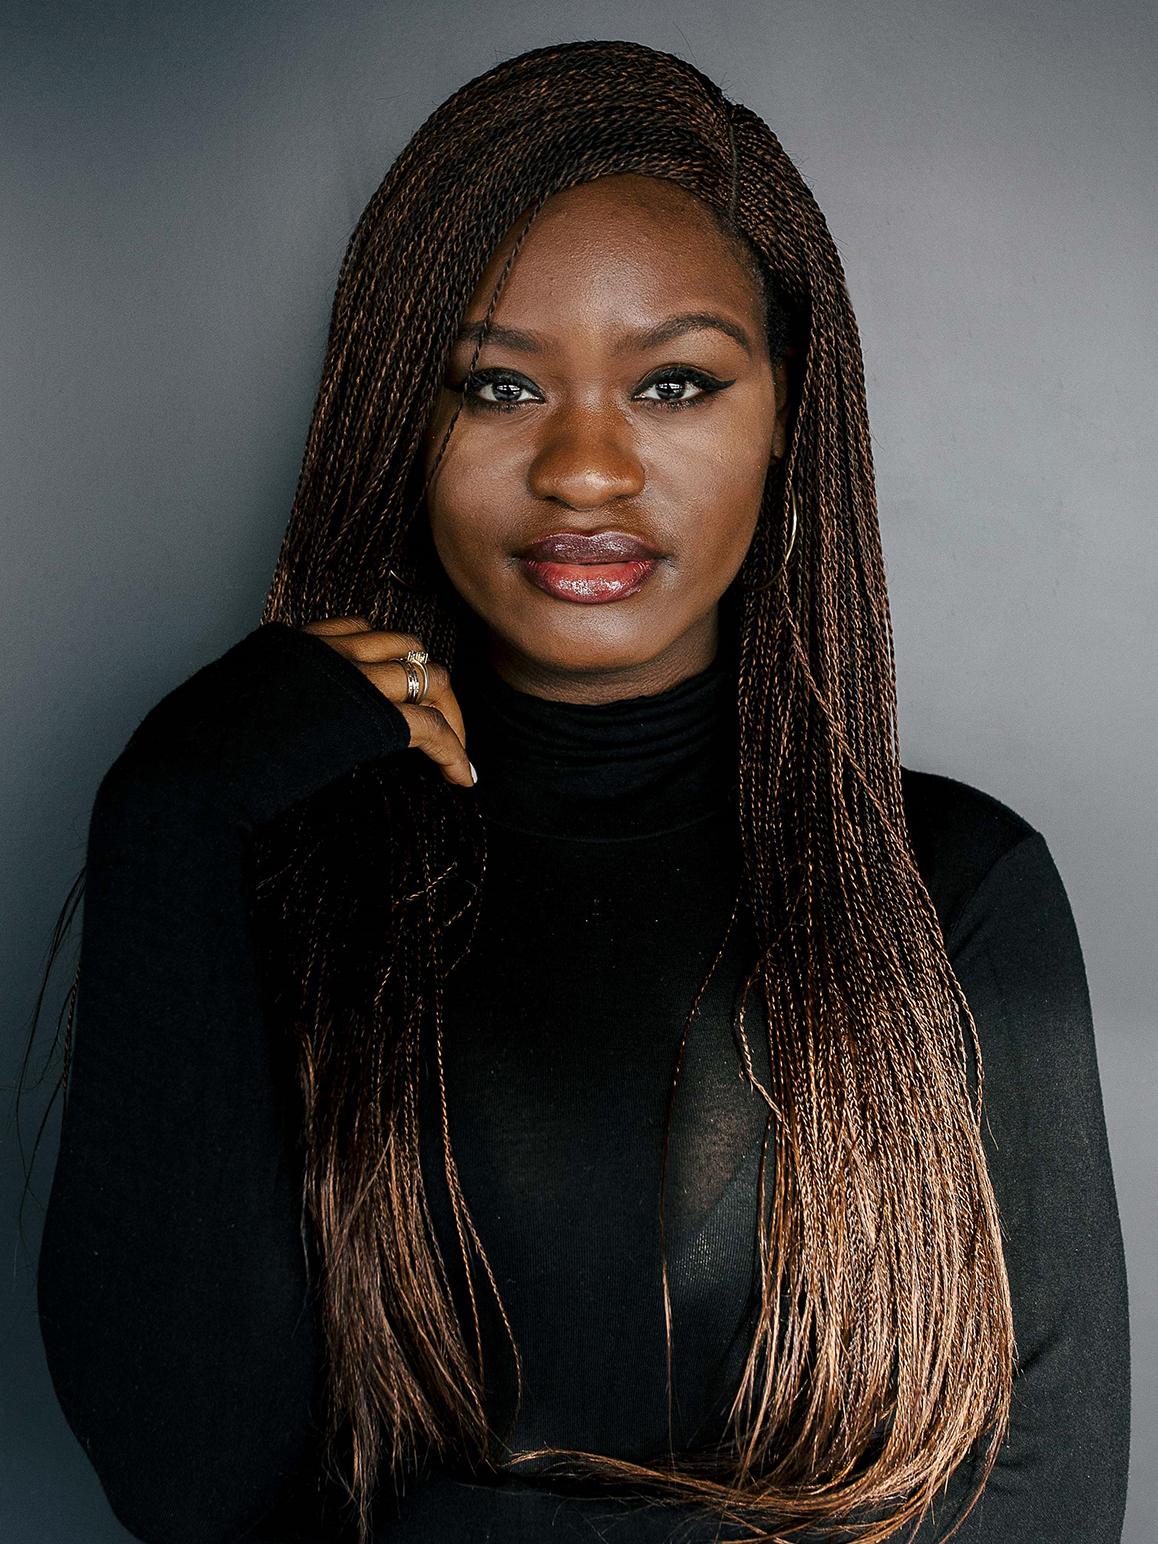 Bolu Babalola On Love In Colour, Diversity & Redefining Romance   PORTER